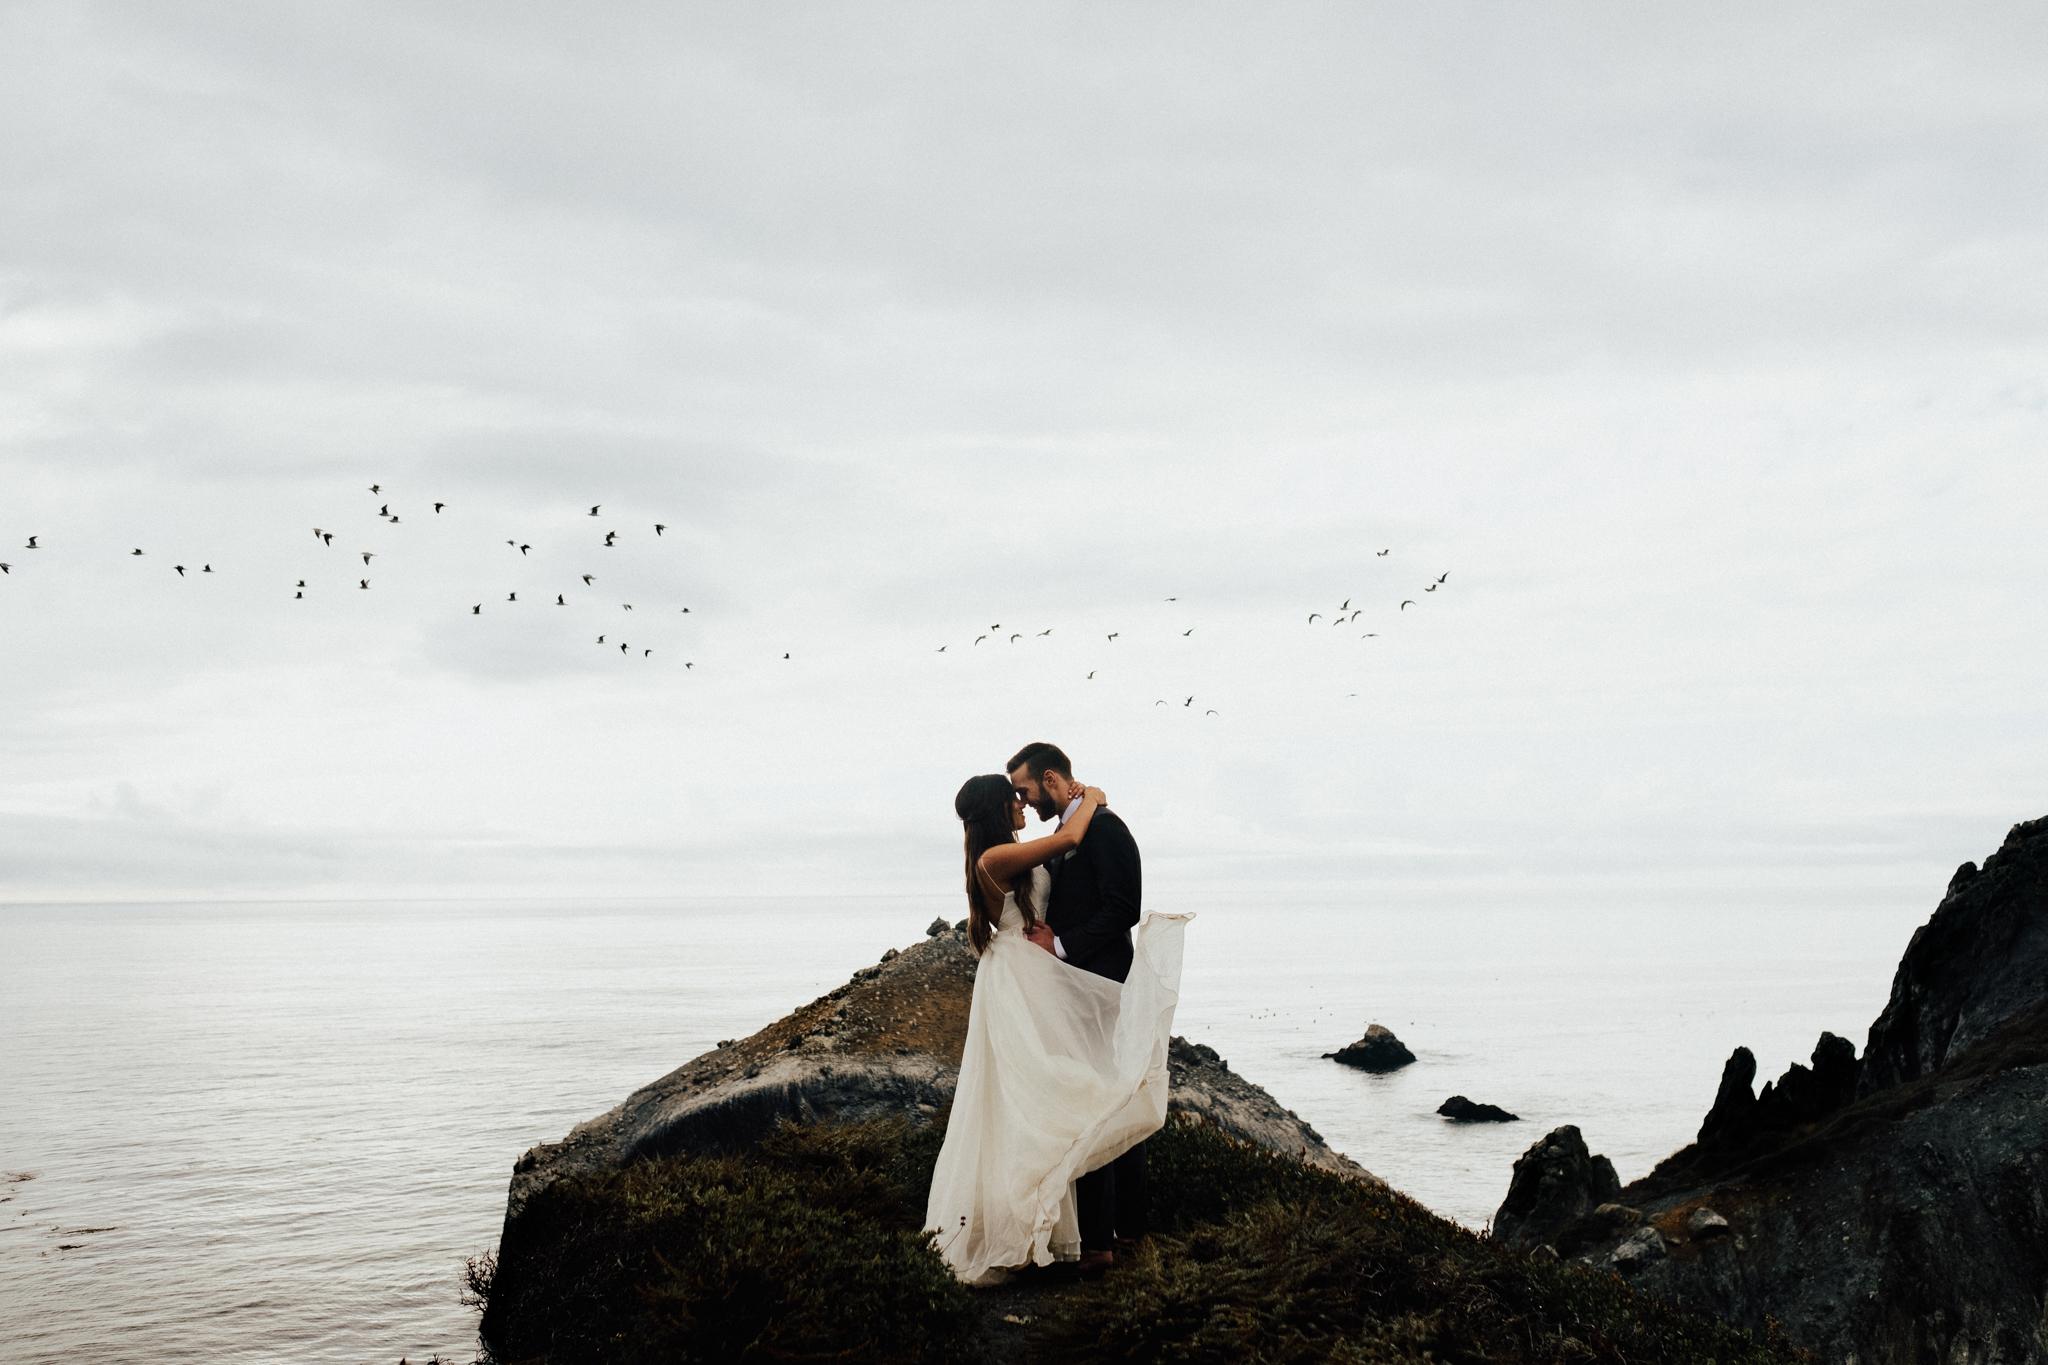 Arizona-Adventure-Elopement-Wedding-Photographer-163.jpg